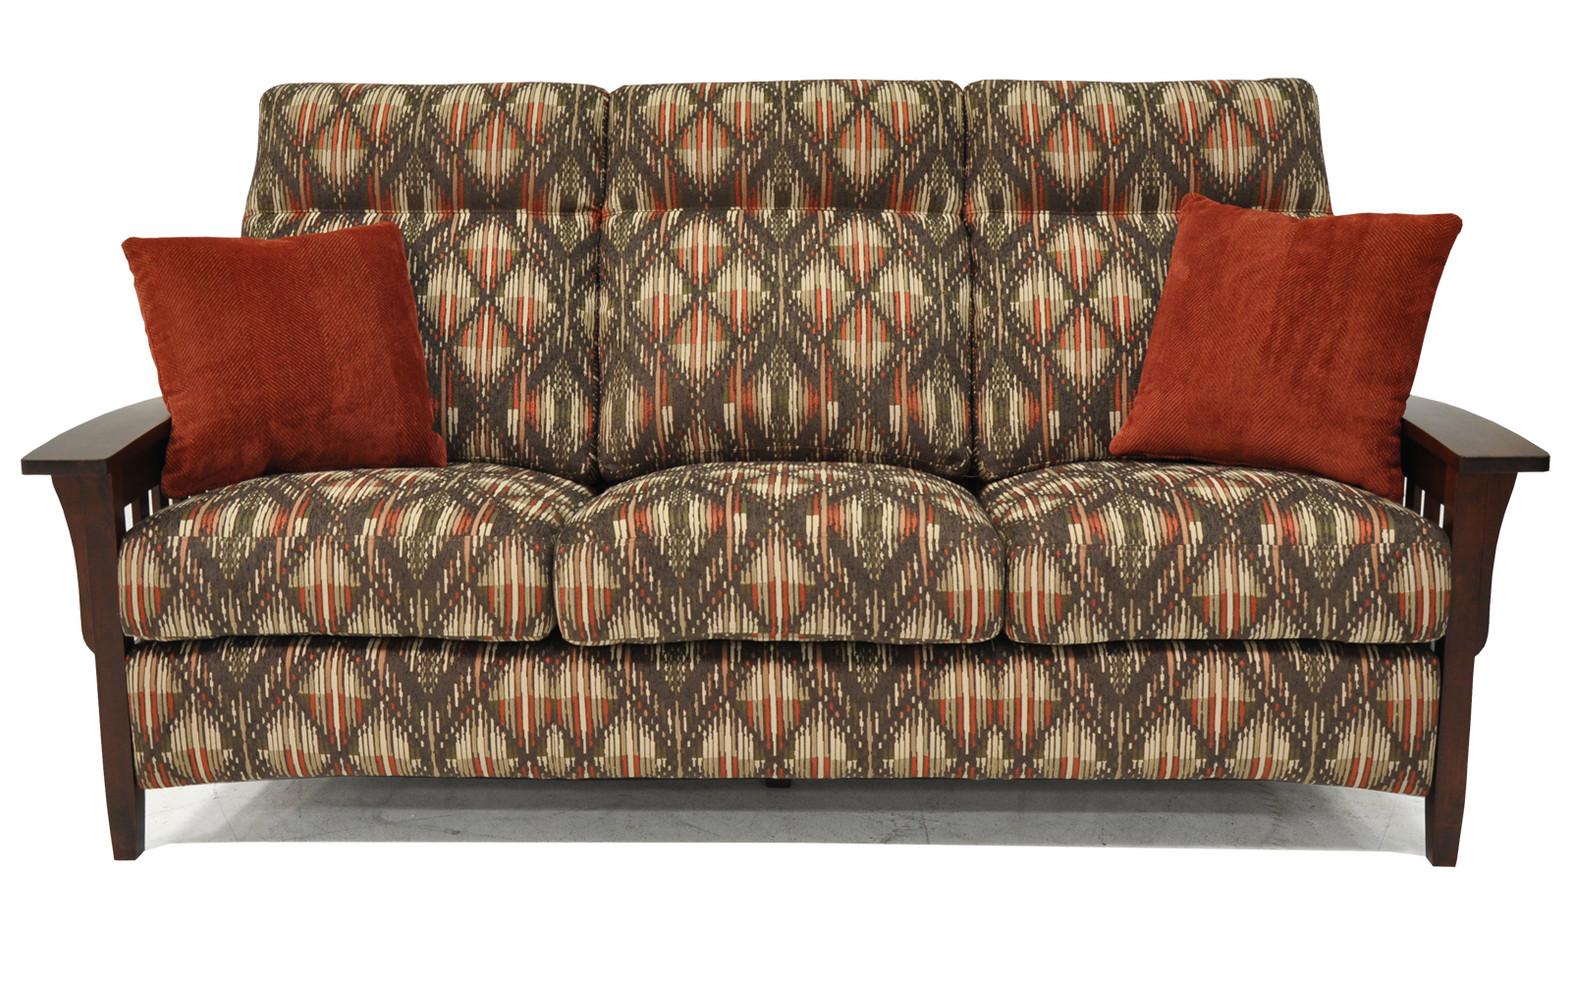 Prairie Mission Sofa in Fabric